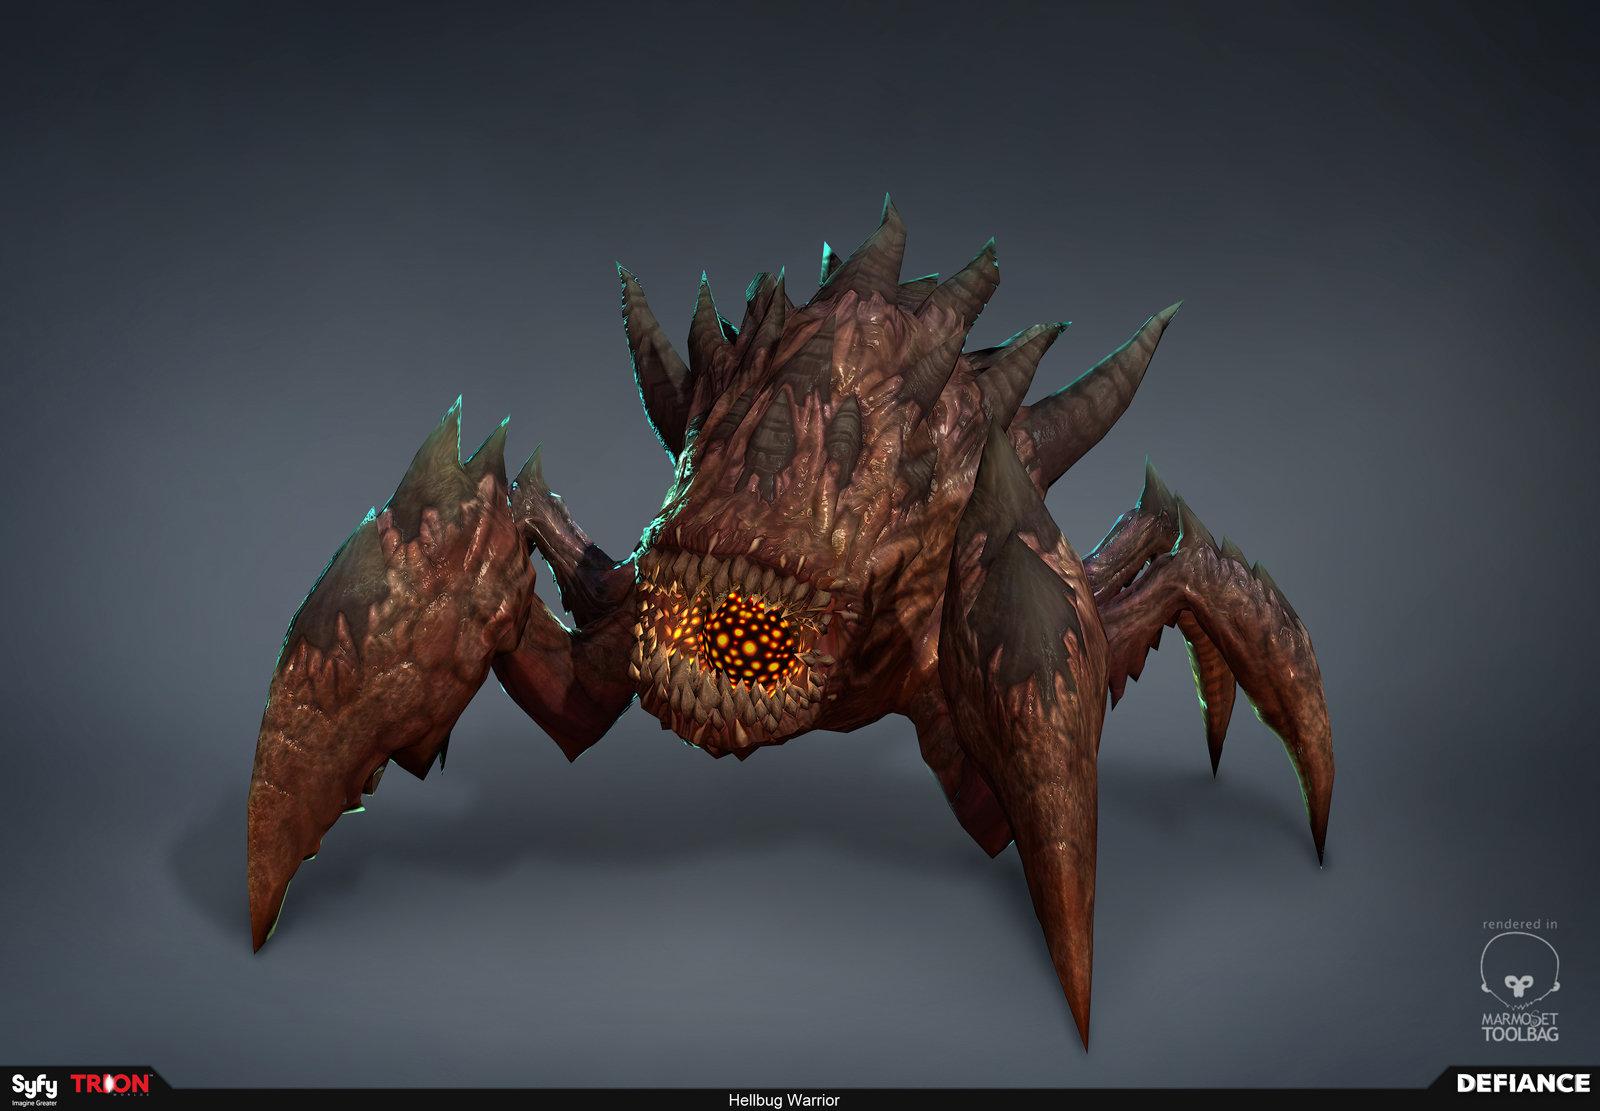 Defiance - Hellbug Warrior